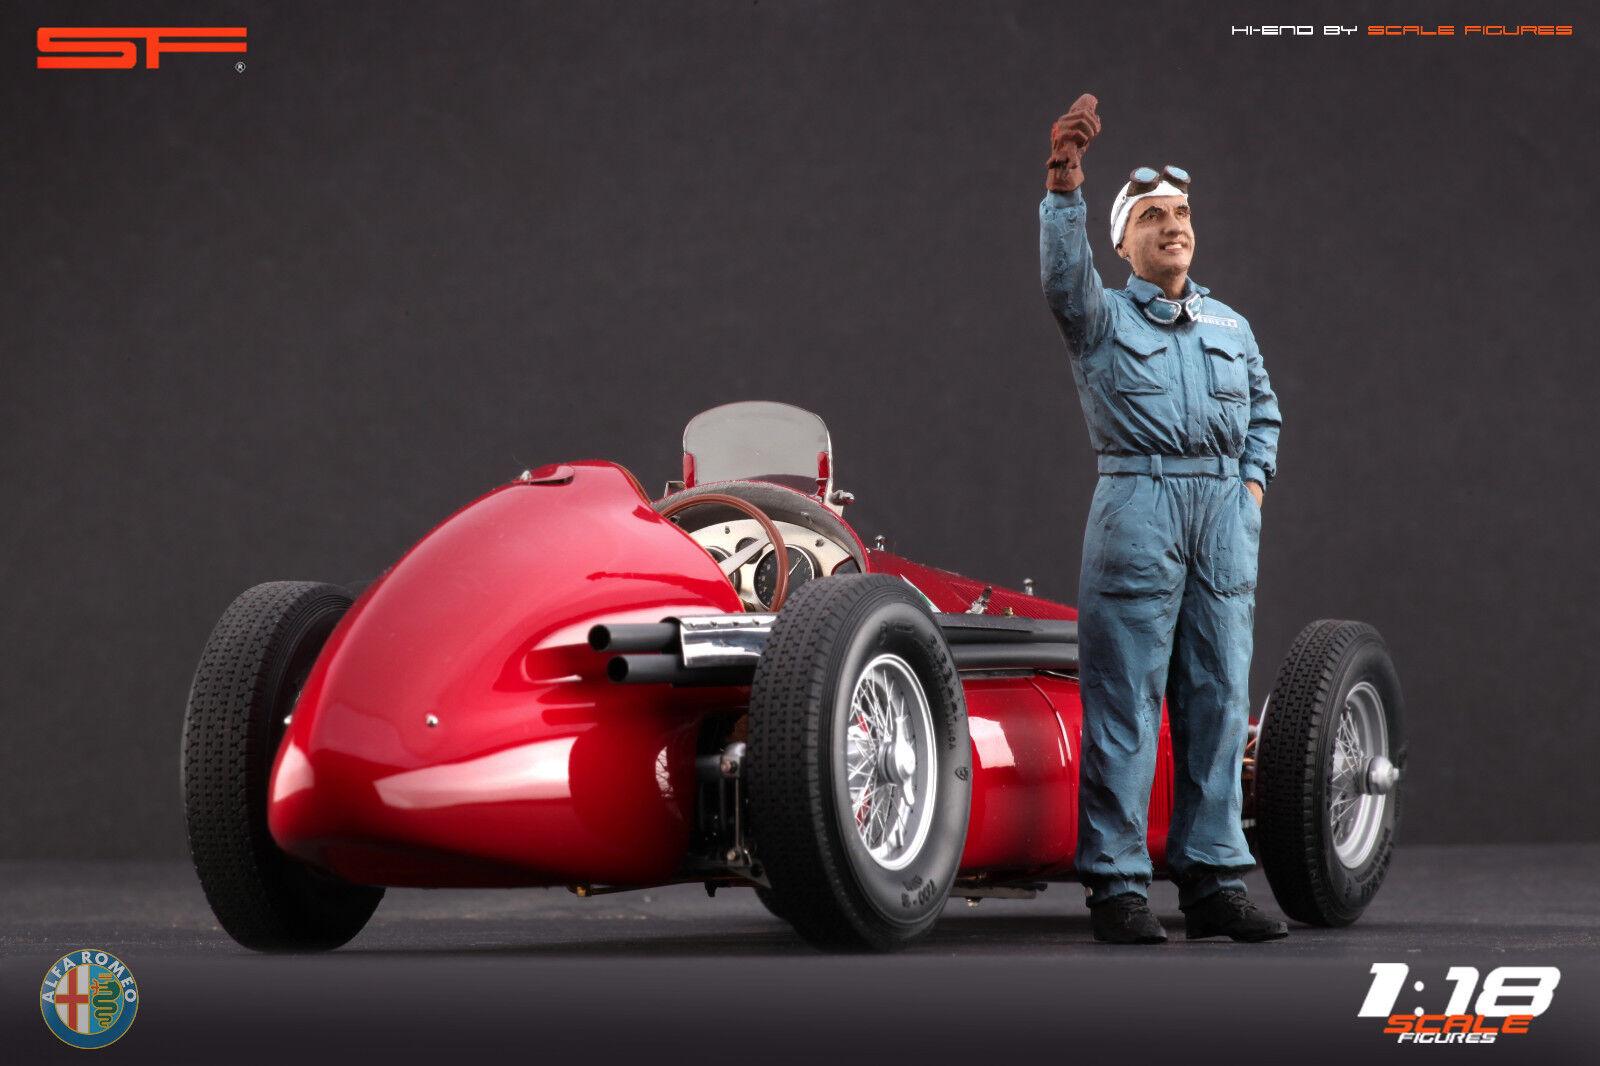 1 18 Nino Farina figurine VERY RARE     NO CARS    for diecast collectors